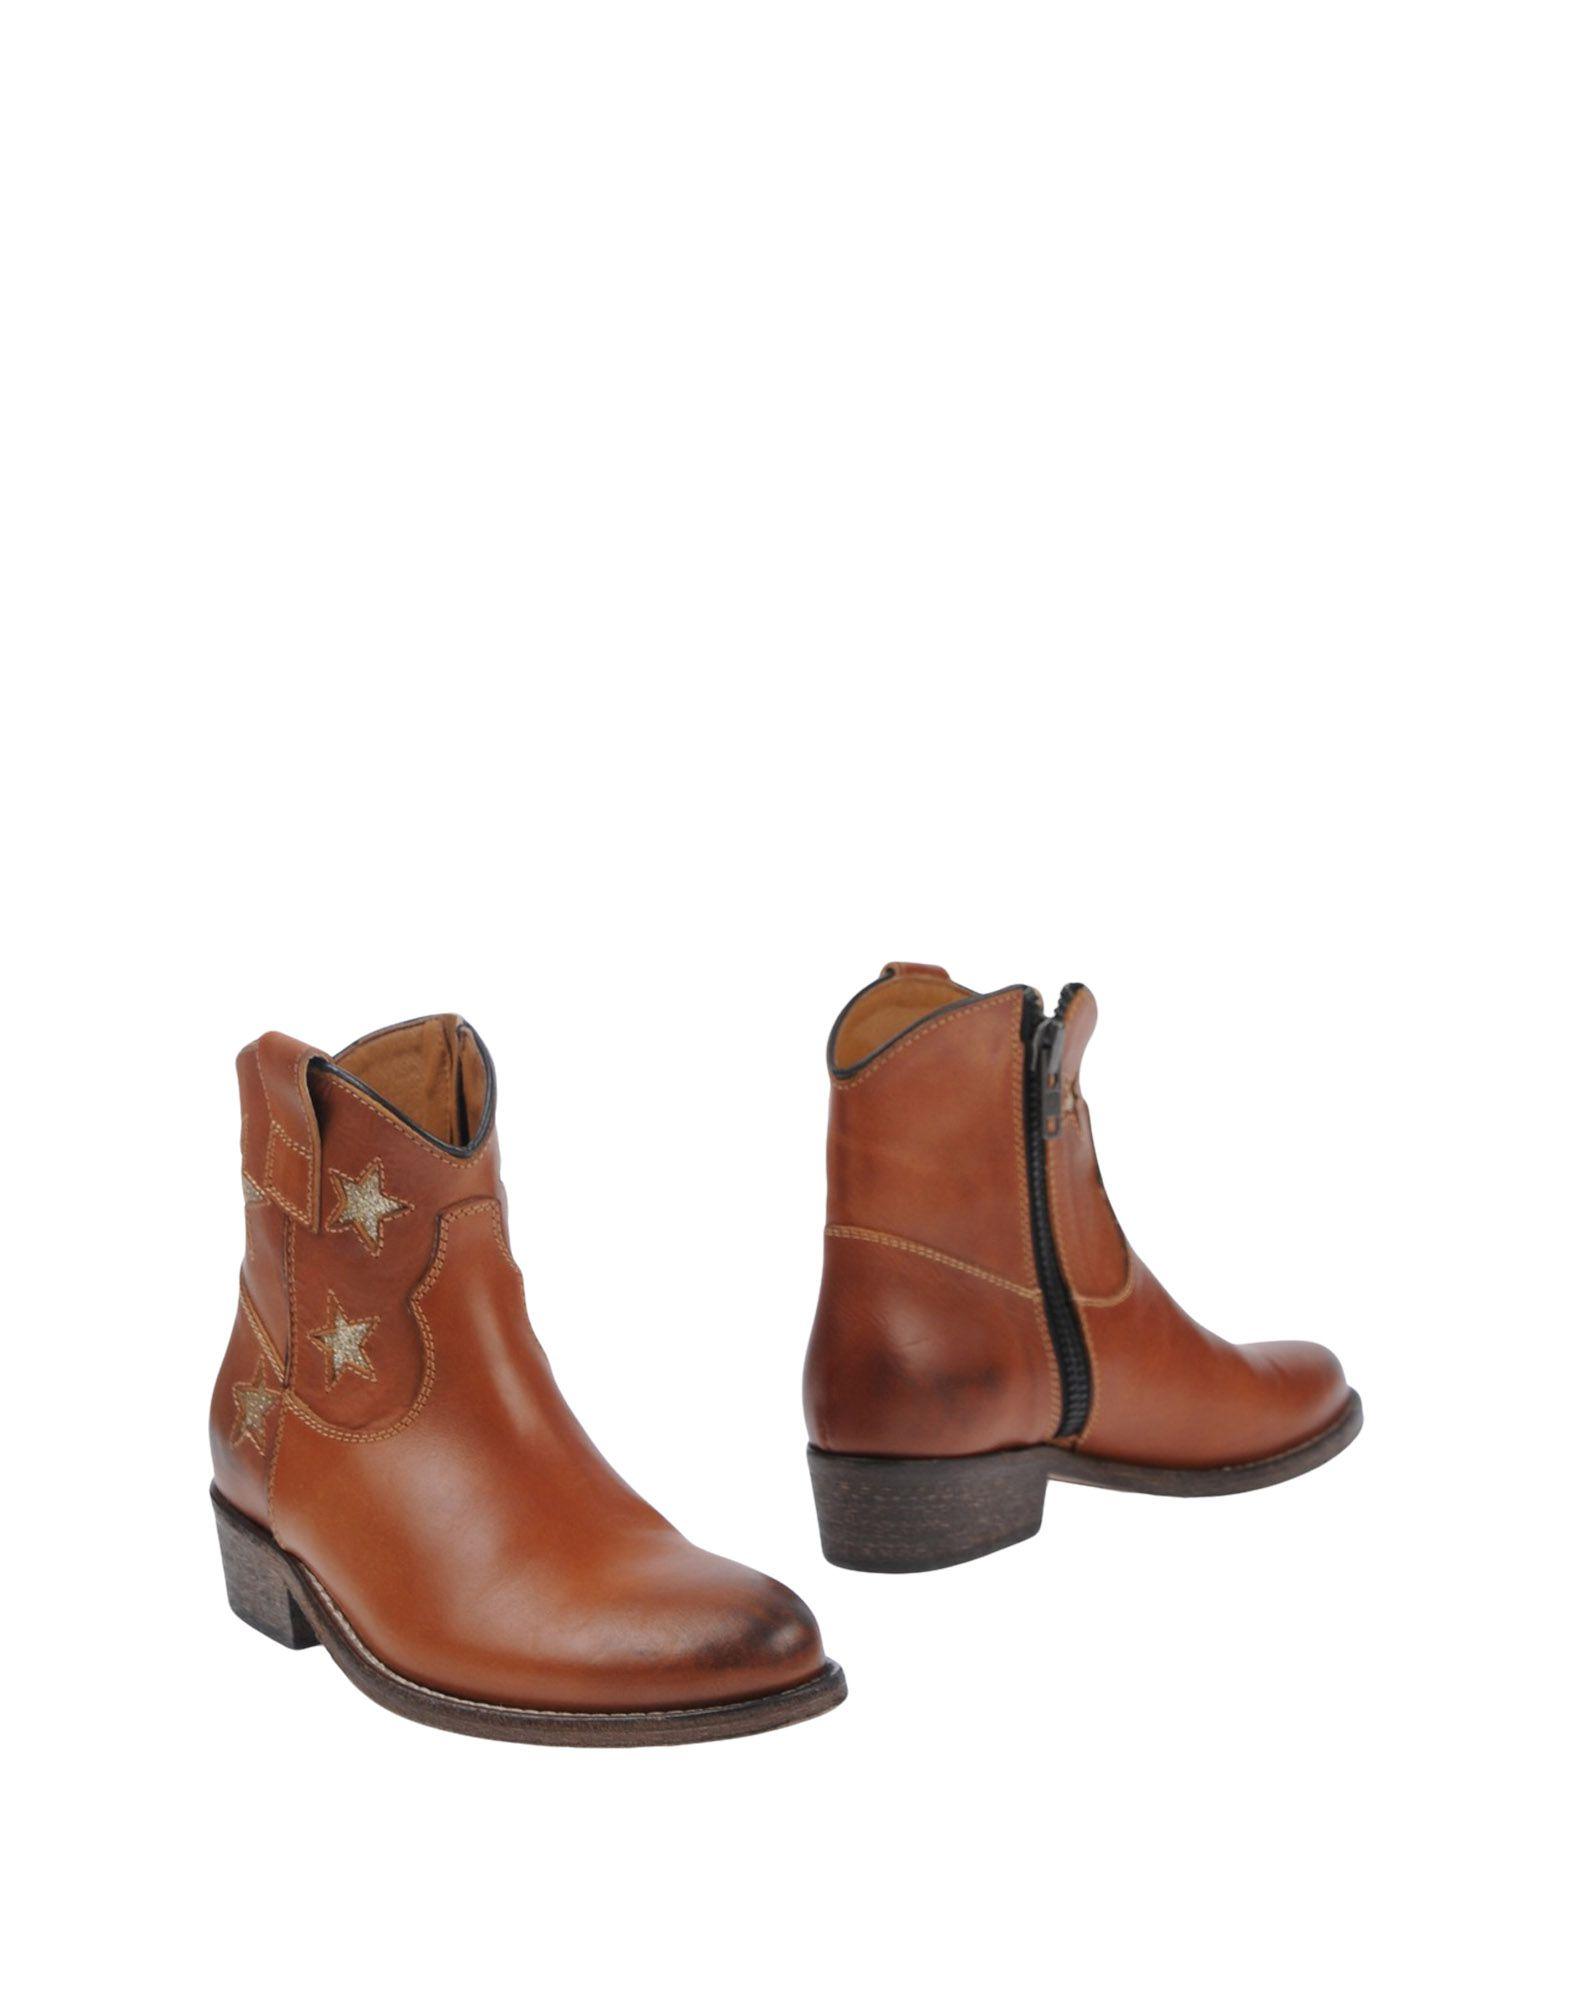 Via Roma 15 Ankle Boot - Women Via Roma on 15 Ankle Boots online on Roma  Australia - 11508775BP 3033d4